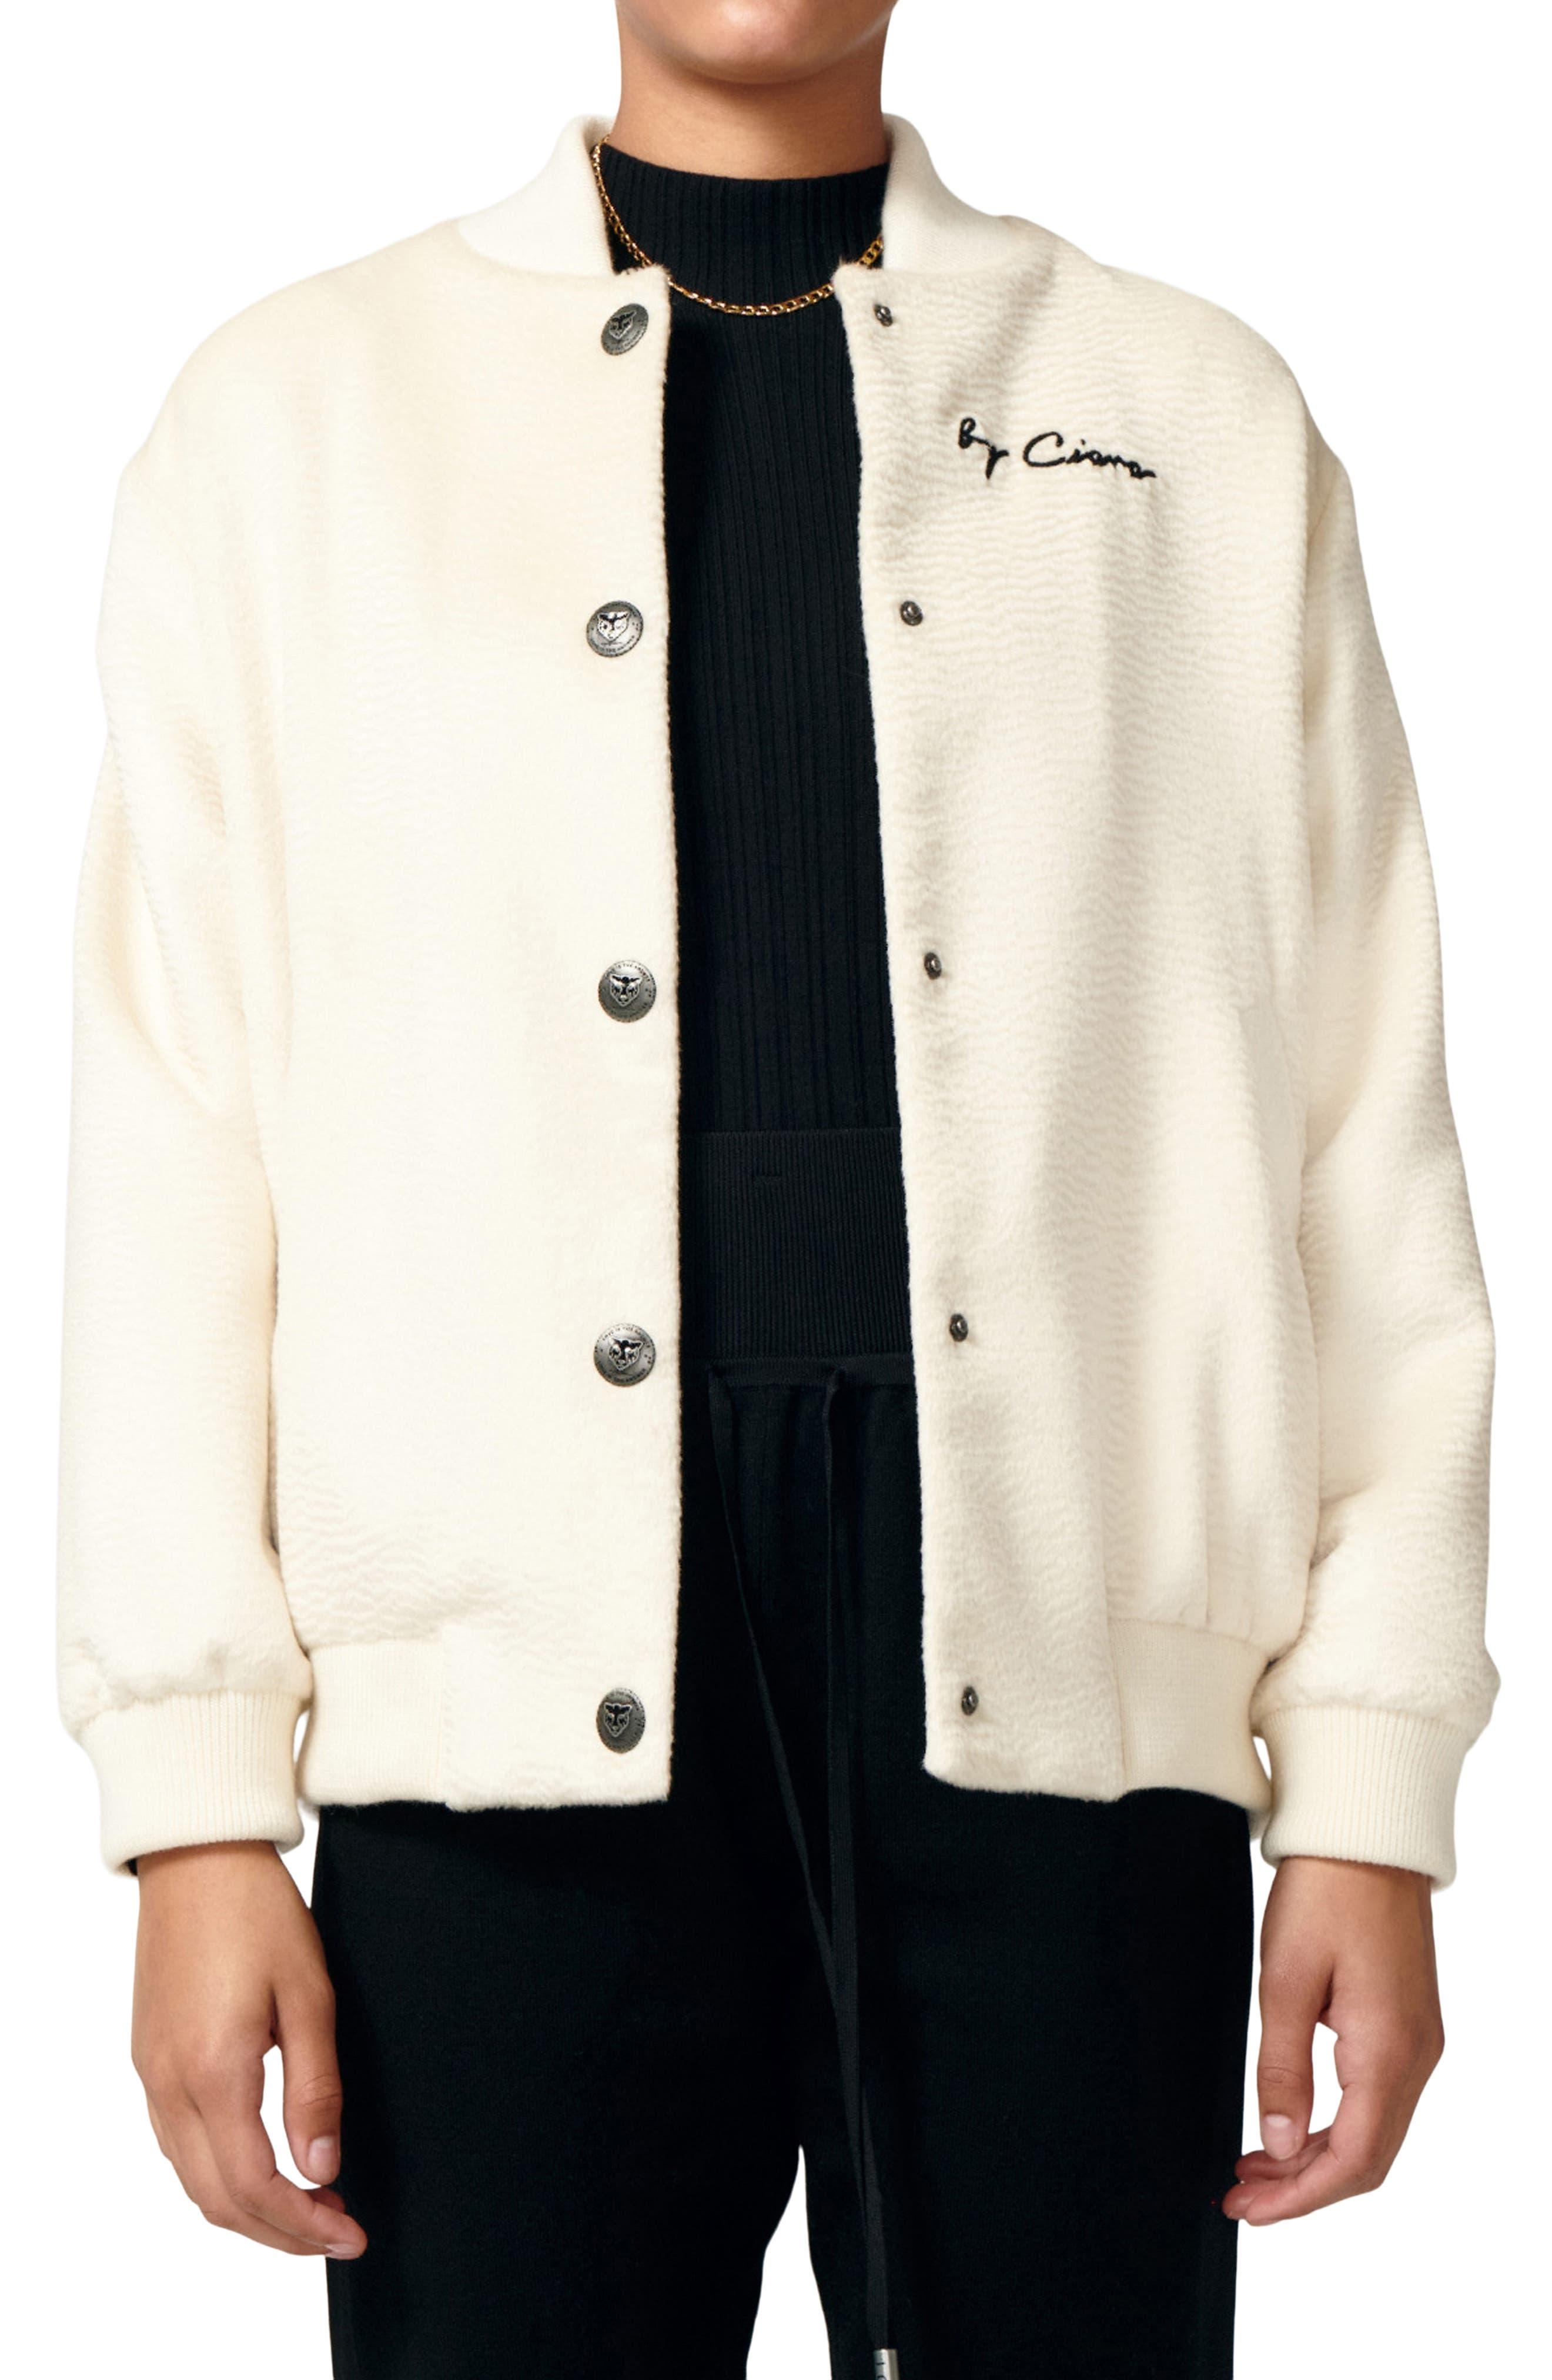 Applique Varsity Jacket